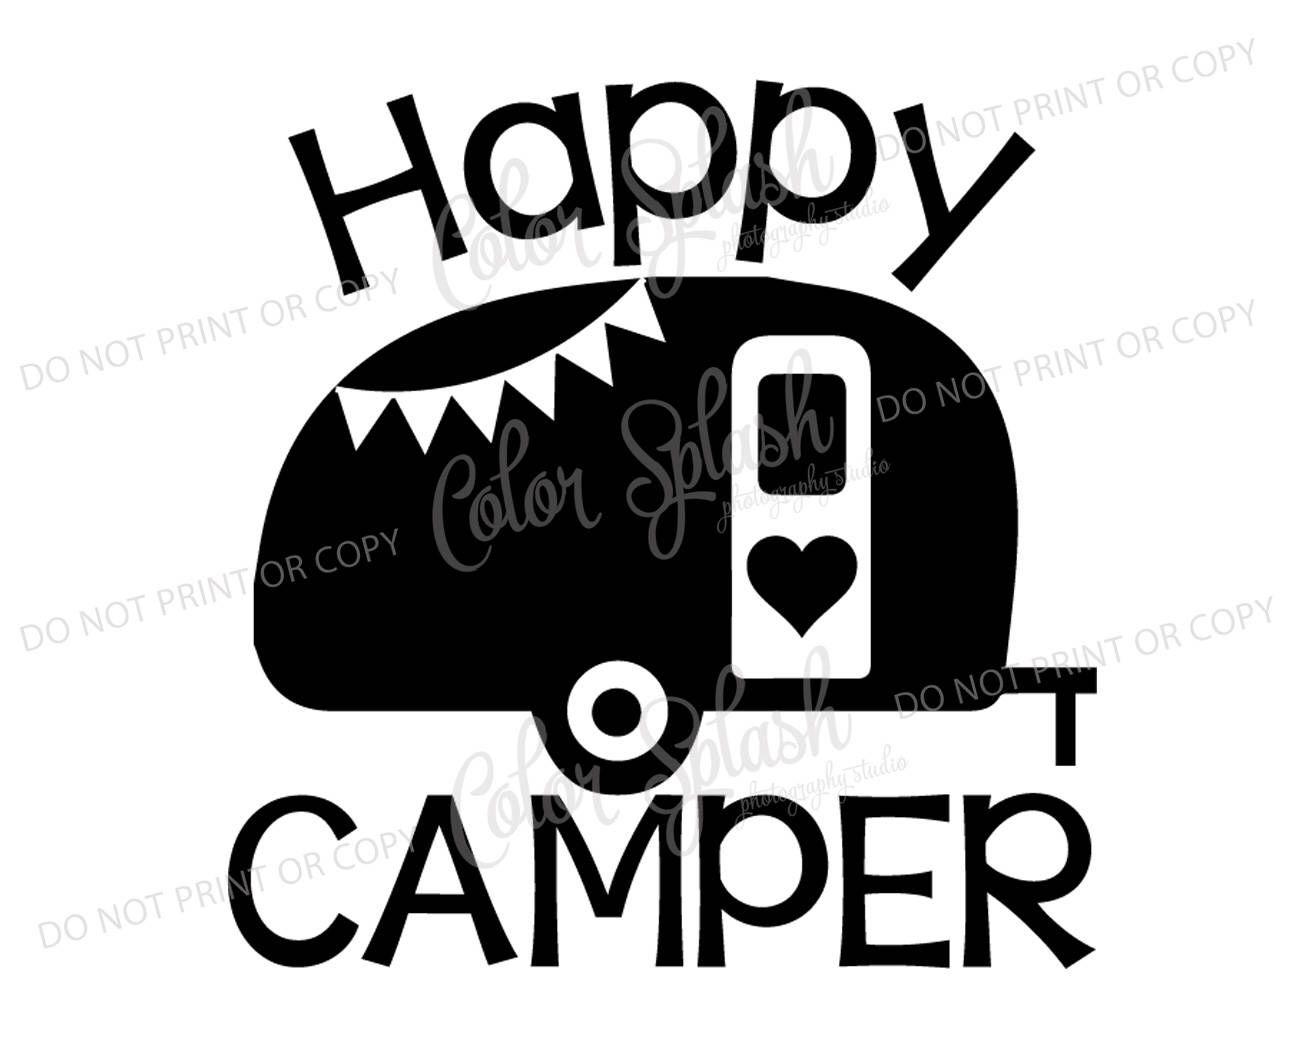 Happy Glamper Glamping Camper Camping Trailer Svg Dxf Png